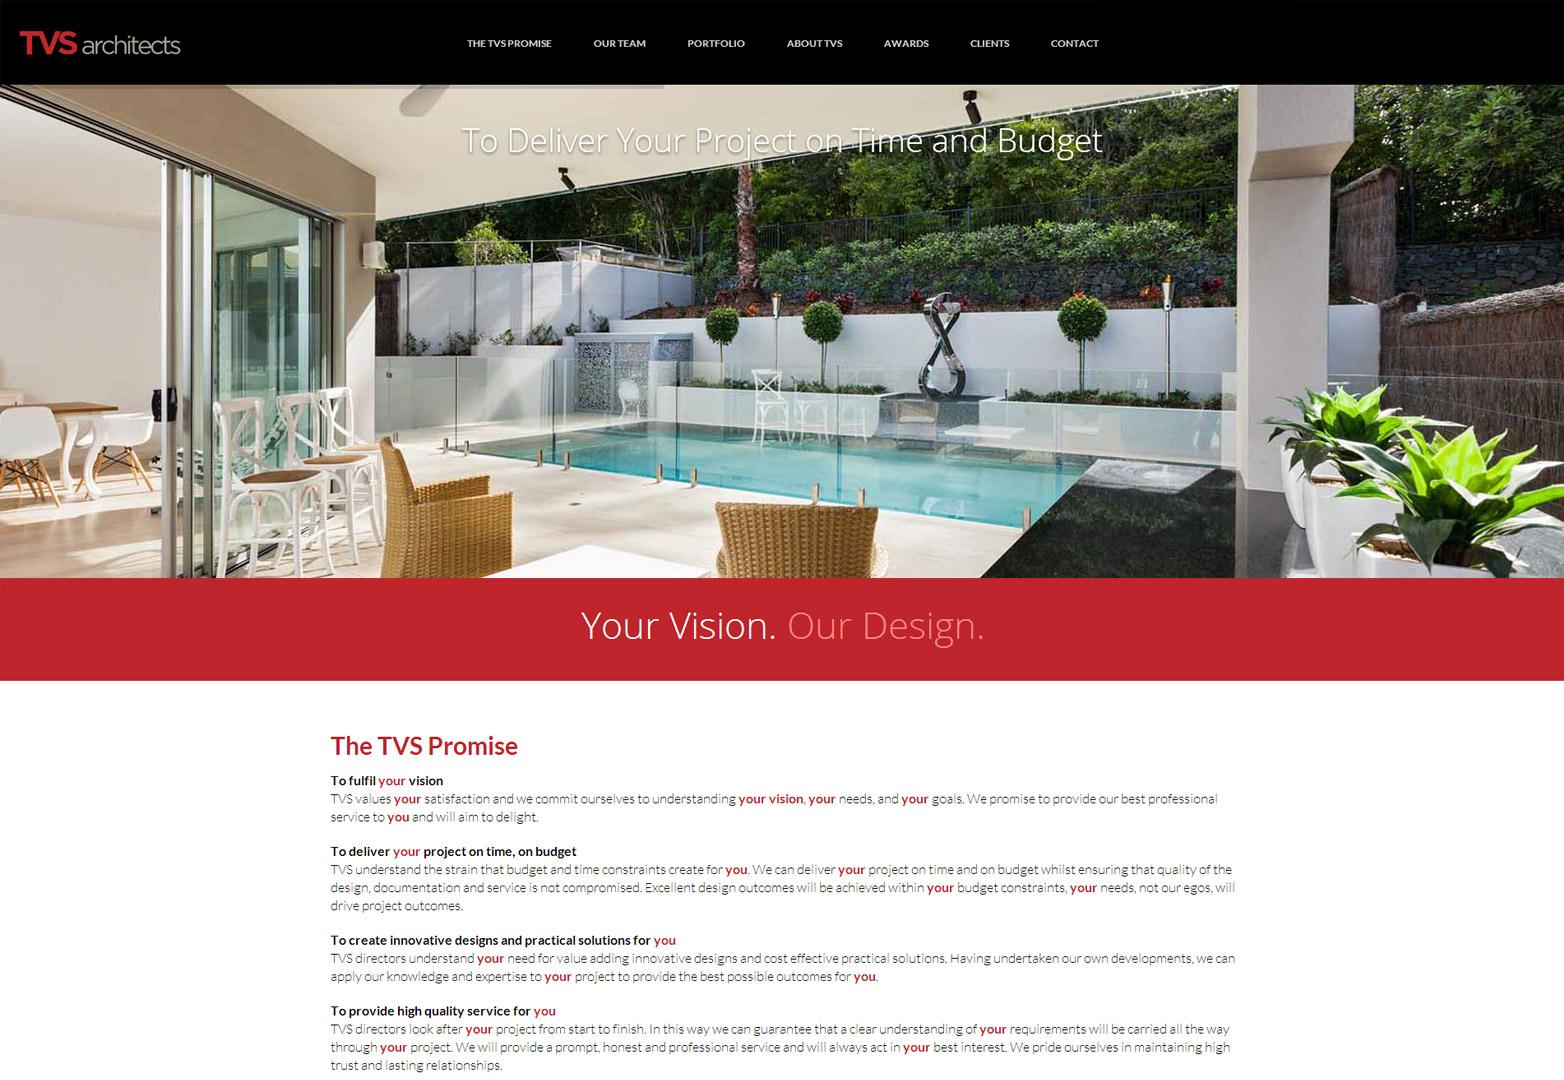 TVS Architects homepage